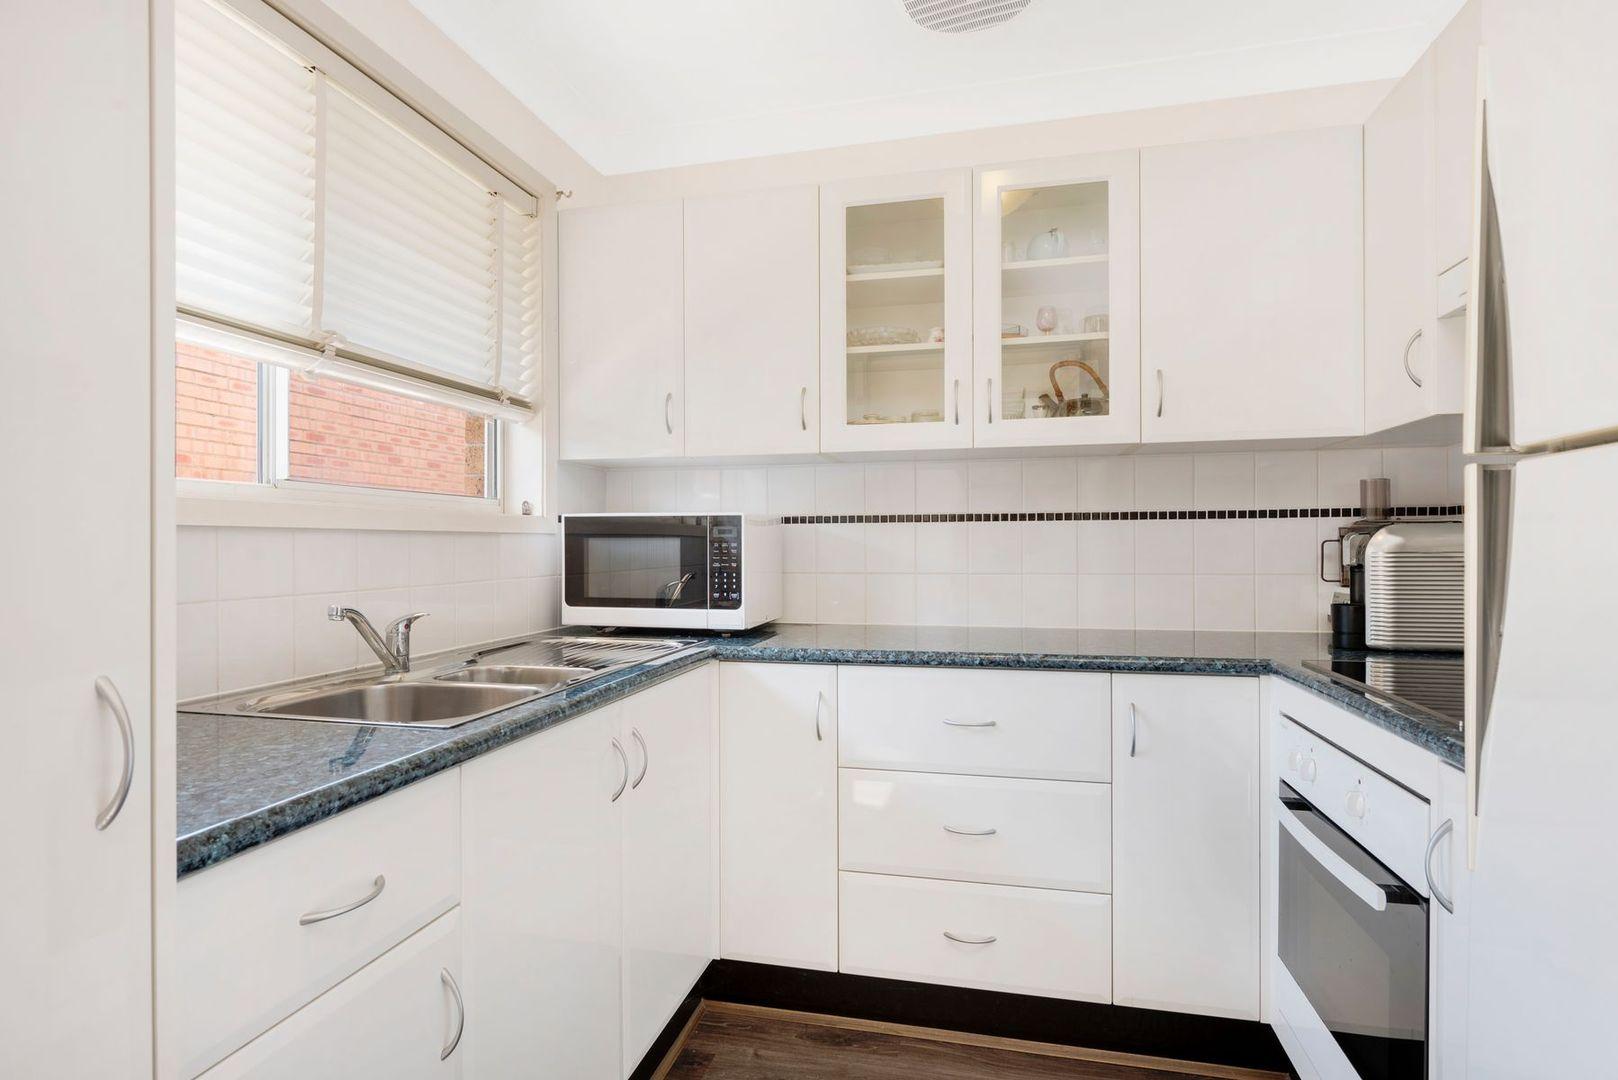 2/54-56 Swadling Street, Long Jetty NSW 2261, Image 2